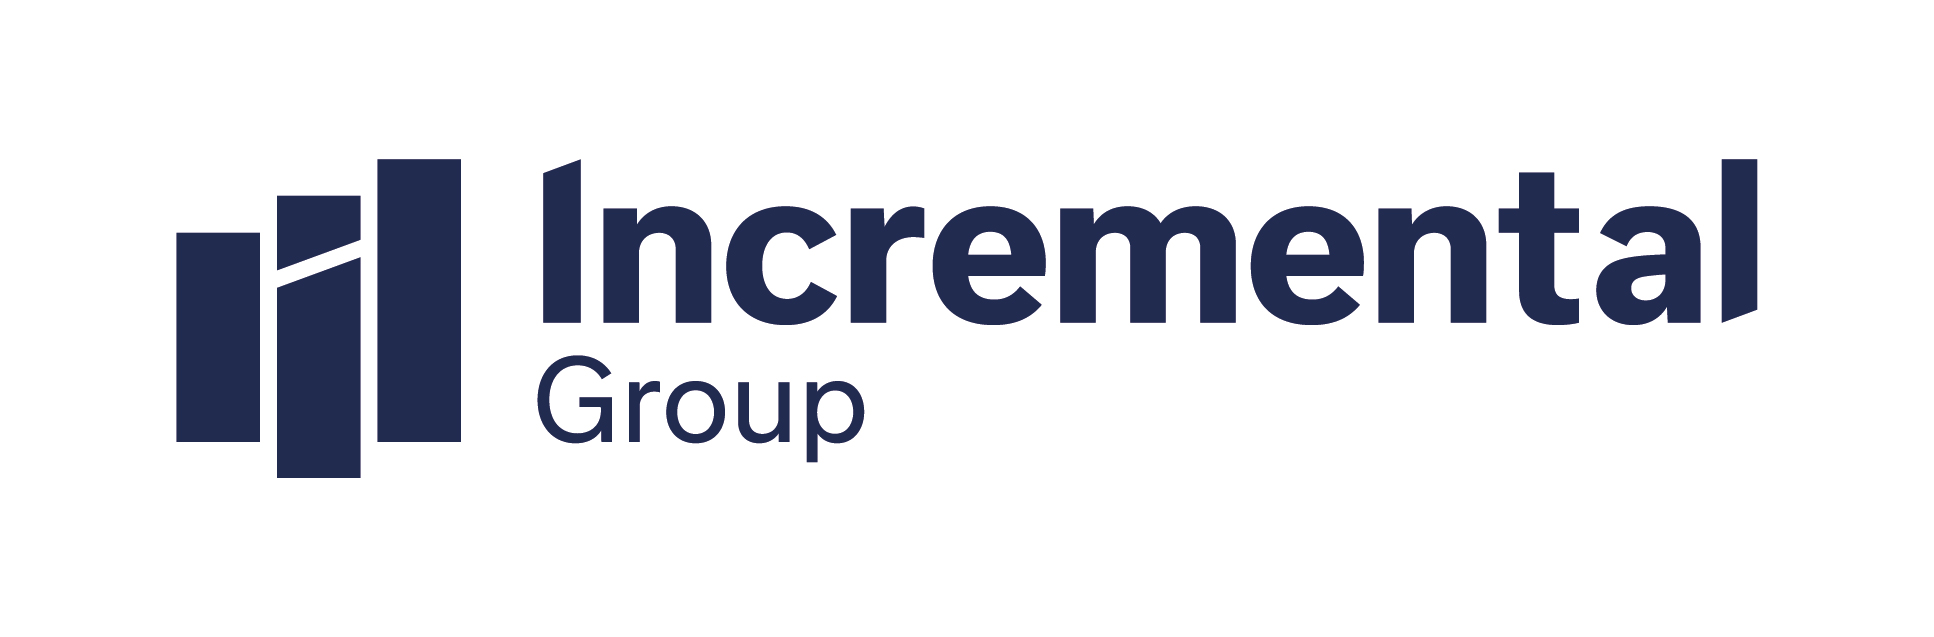 Incremental_Group_Inc_Logo_Full_Navy_On_Background.jpg